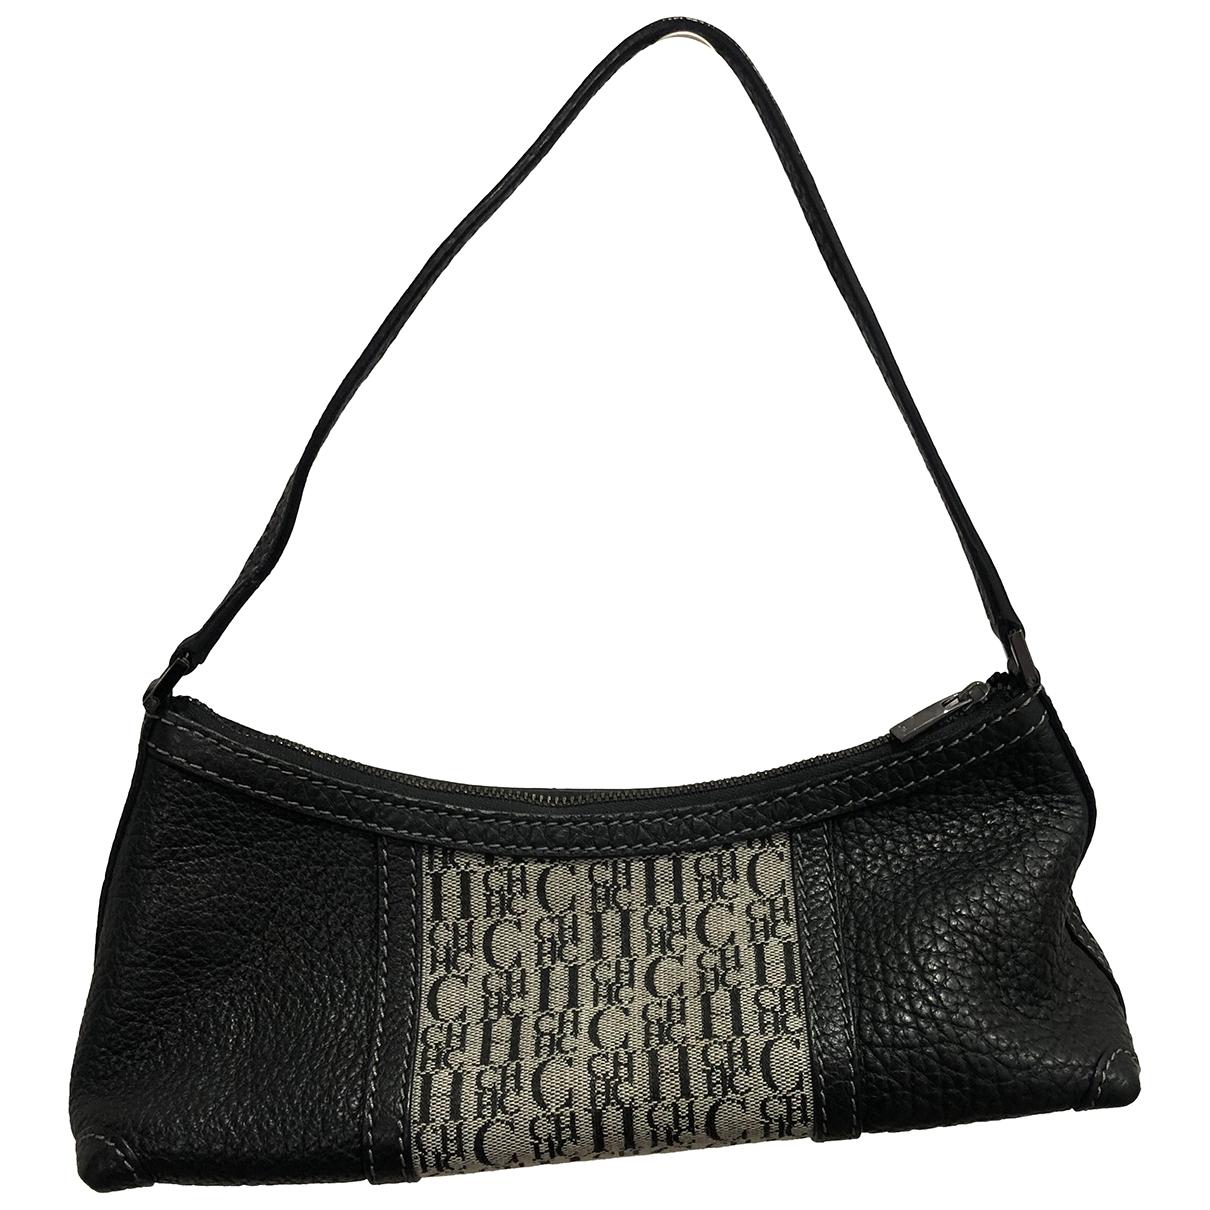 Carolina Herrera \N Black Fur Clutch bag for Women \N